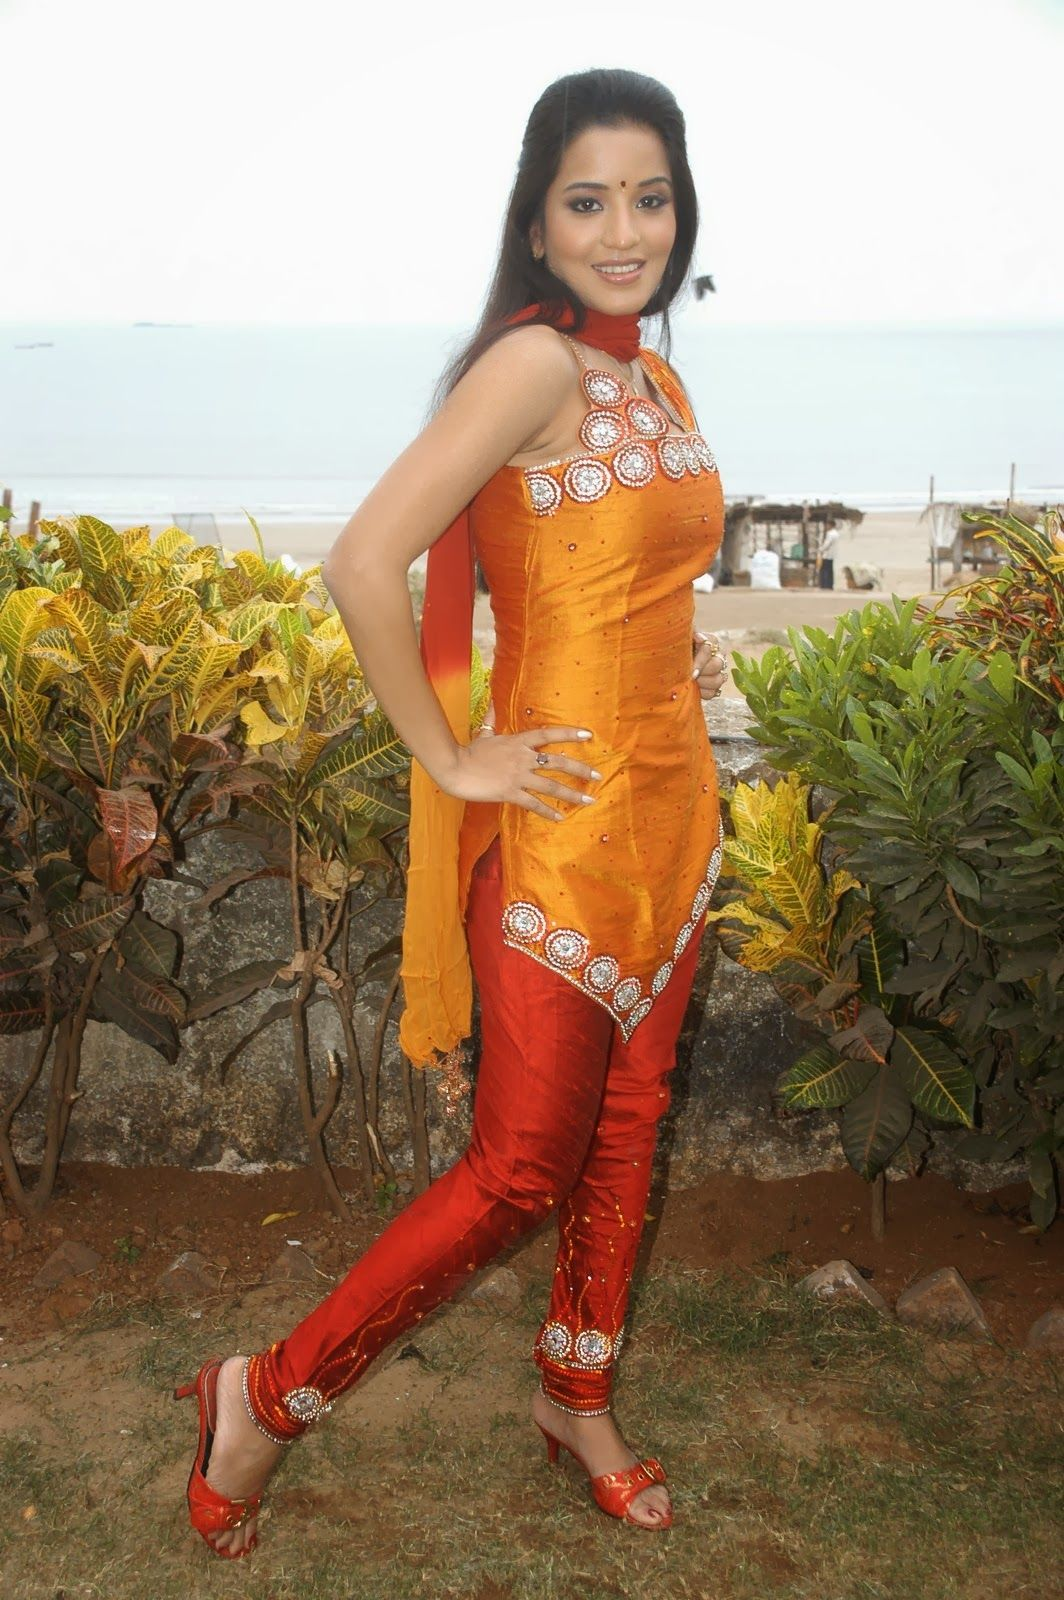 Hot Bhojpuri Actress Monalisa Photos Gallery - Bhojpuri -3113